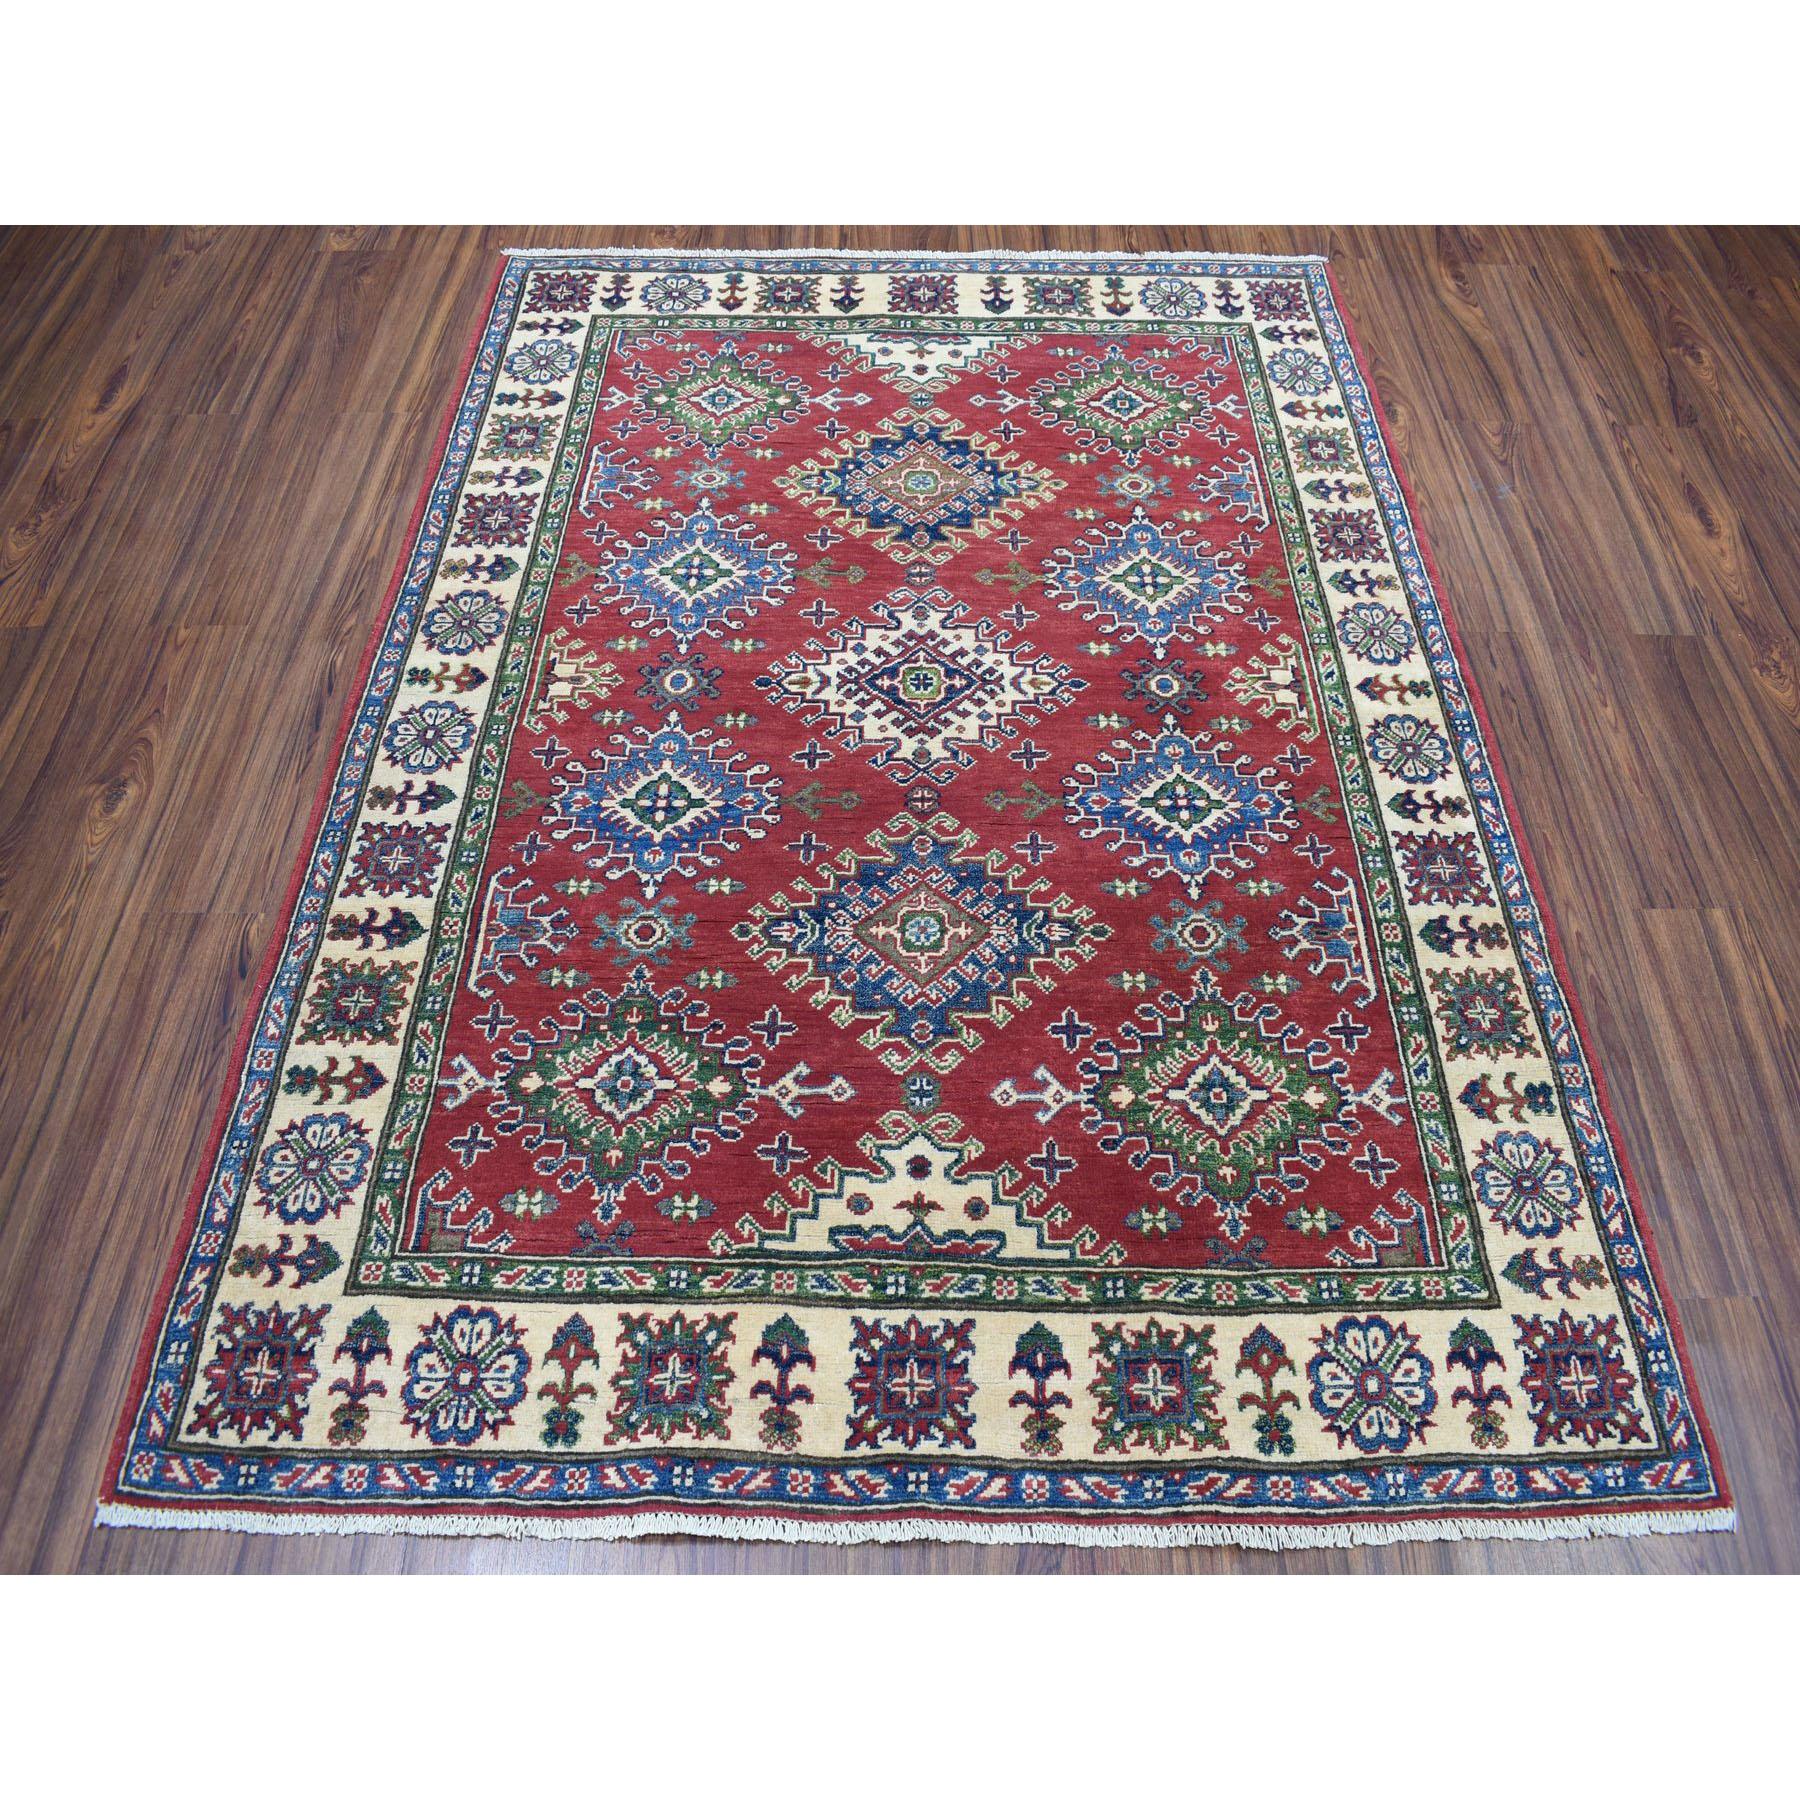 5-x6-5  Red Kazak Pure Wool Geometric Design Hand-Knotted Oriental Rug